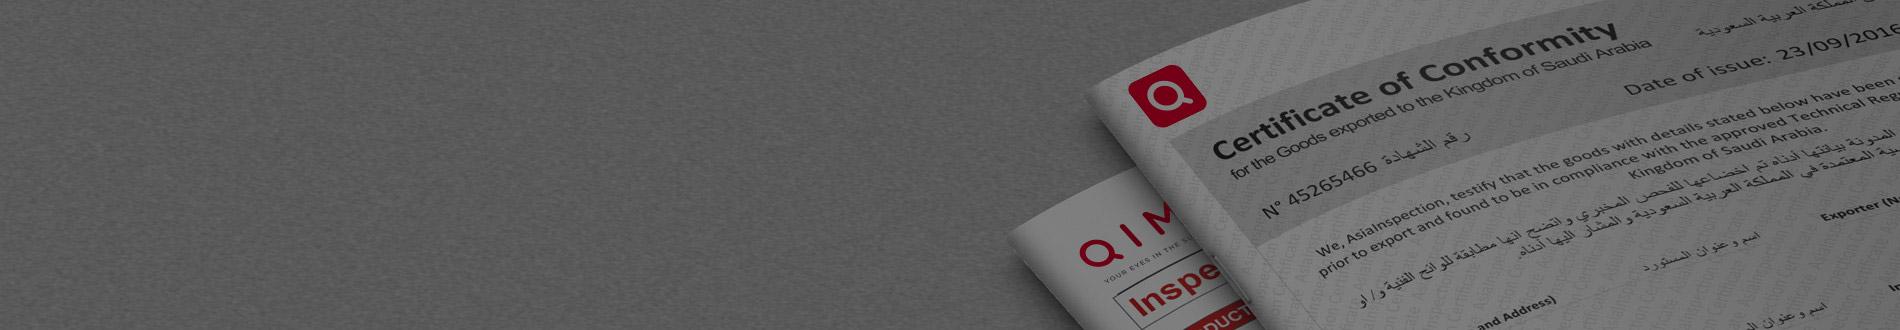 SASO Certificate of Conformity | QIMA